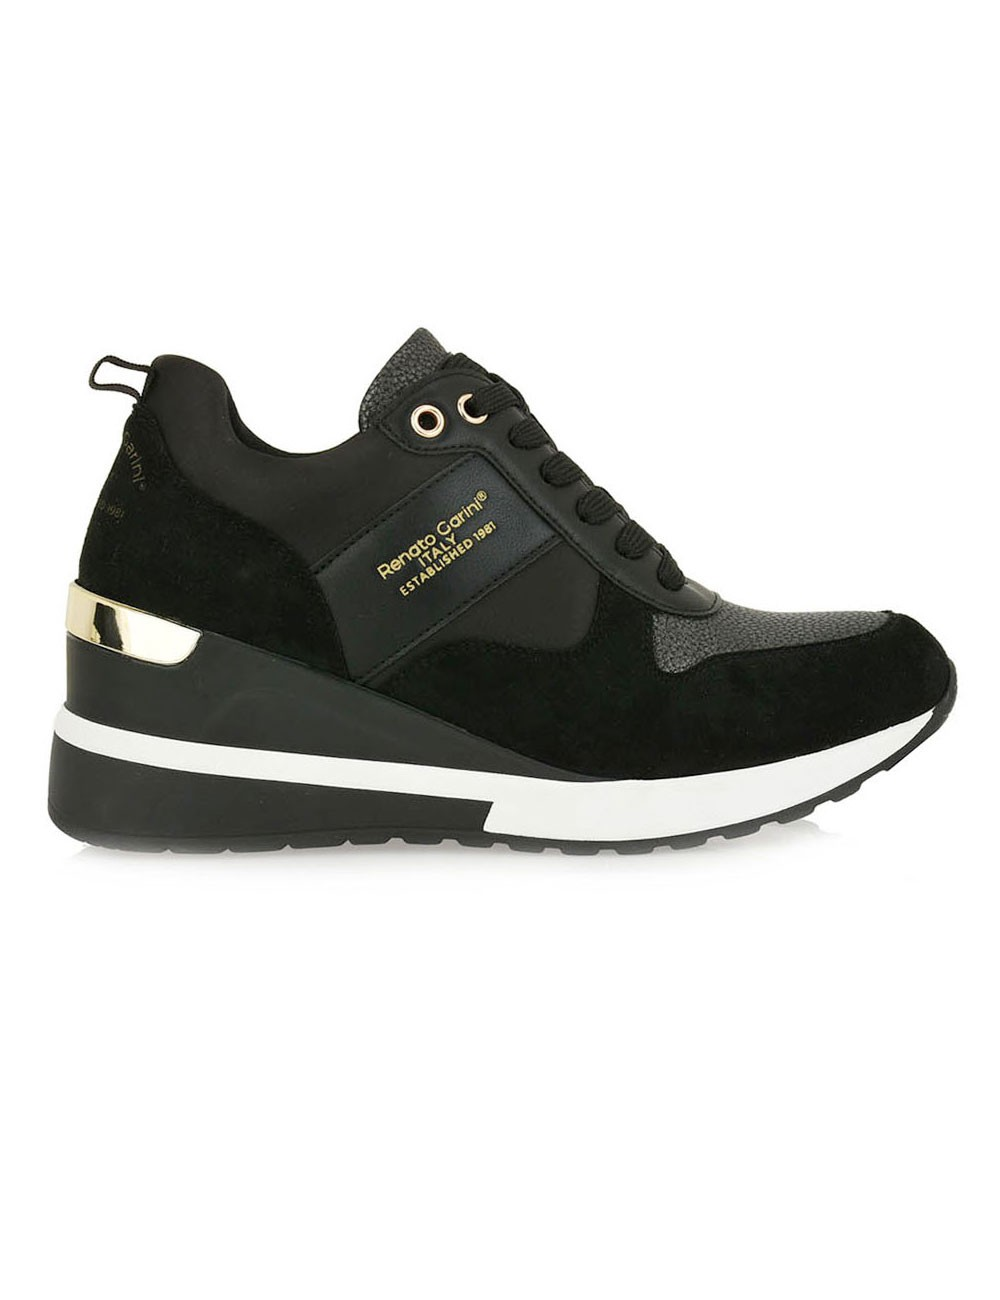 Renato Garini Γυναικεία Παπούτσια Sneakers 342-19R Μαύρο Kαστόρι-Σατεν N119R3423P80